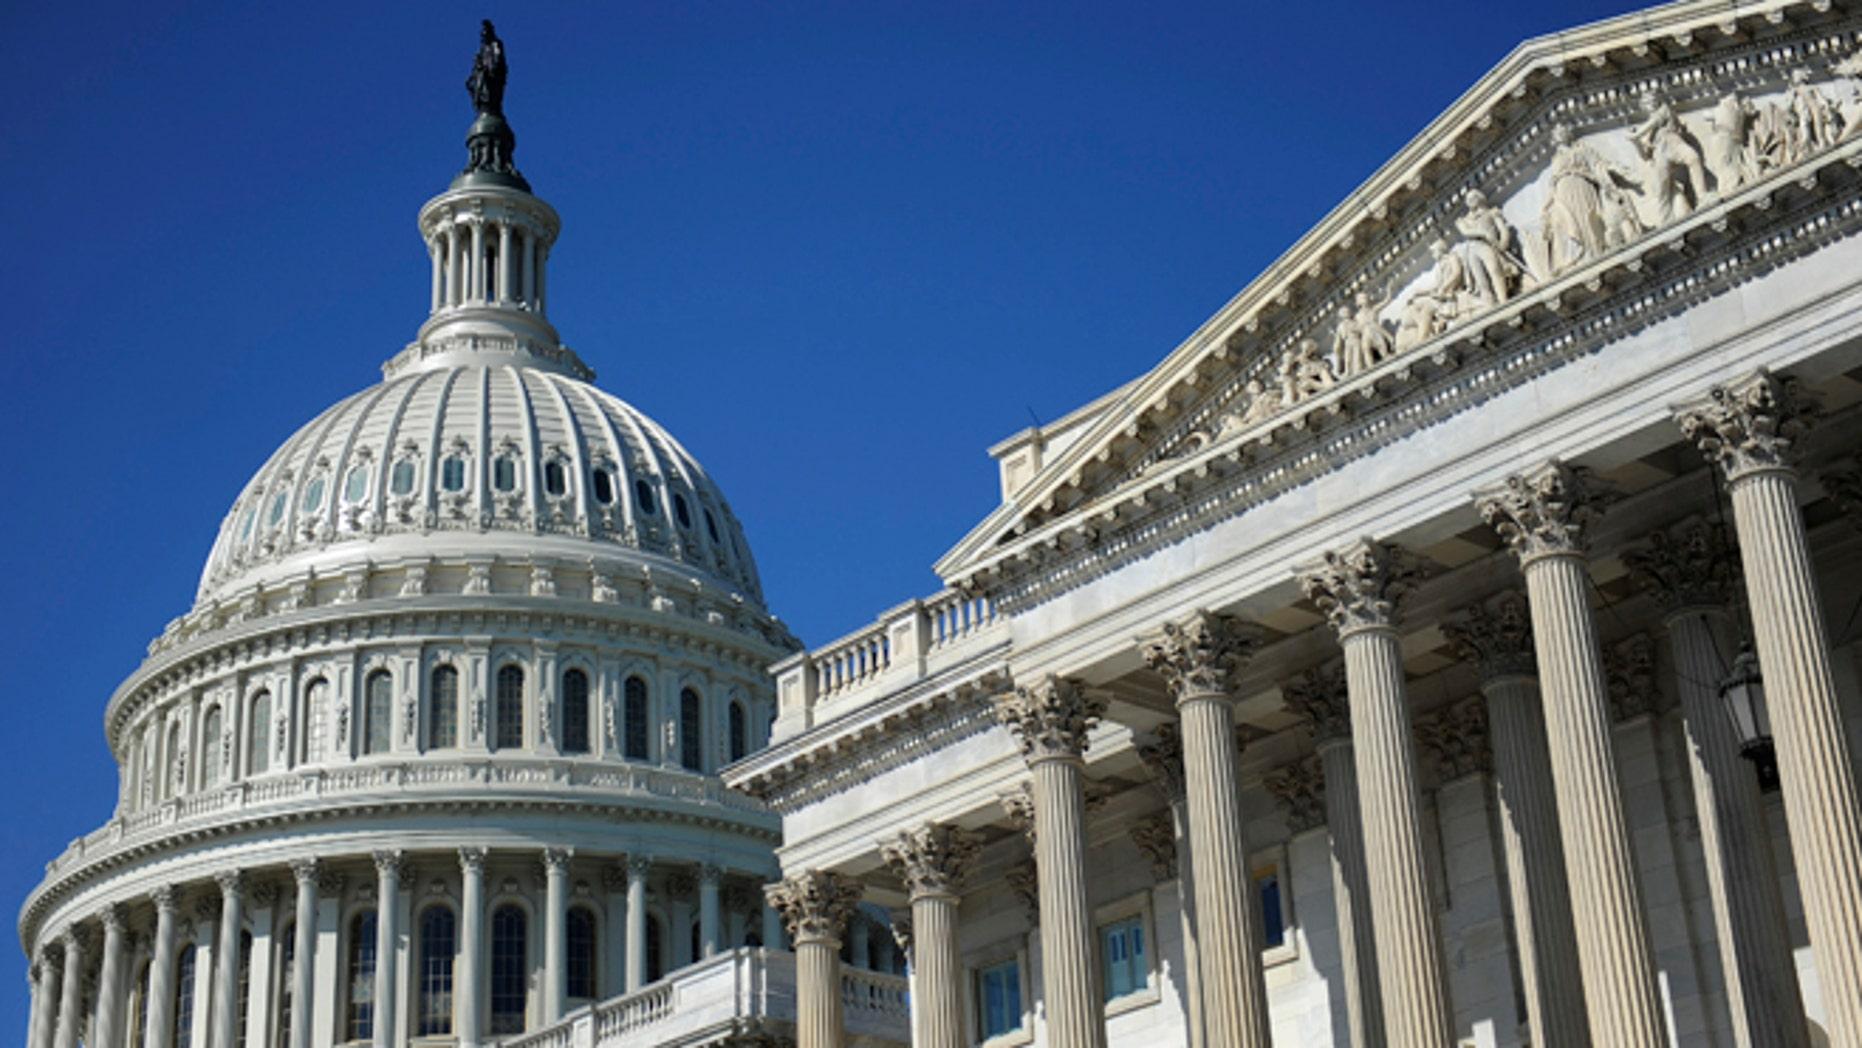 August 2, 2011 file photo of the U.S. Capitol dome and U.S. Senate in Washington.